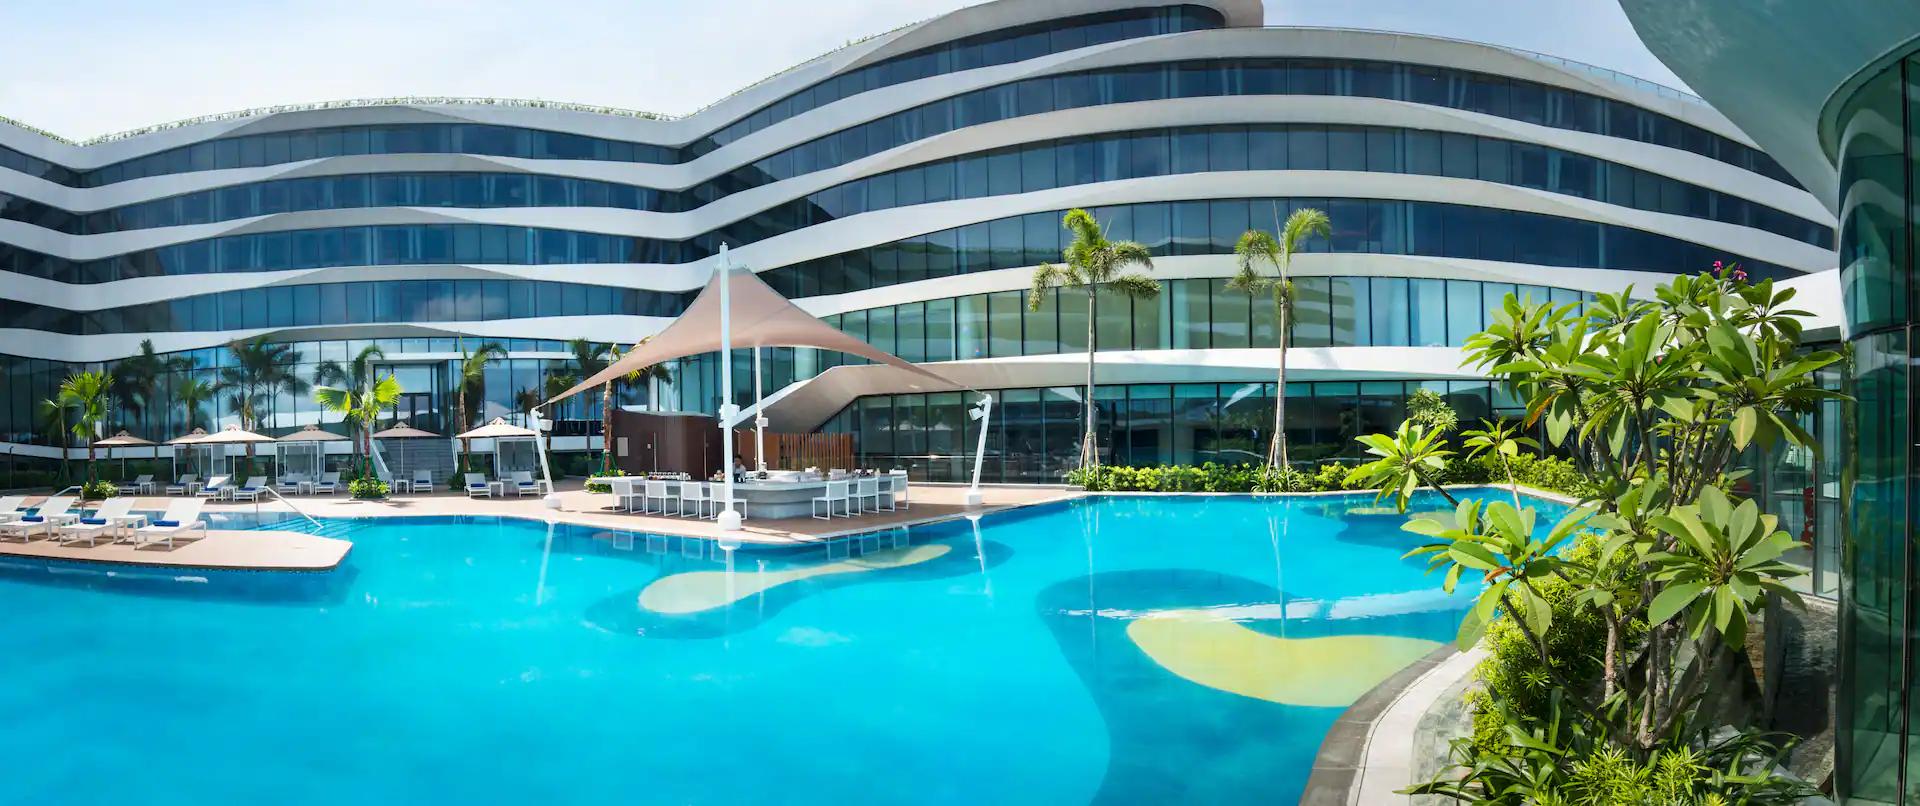 Panorama view of Conrad Hotel Manila's outdoor pool